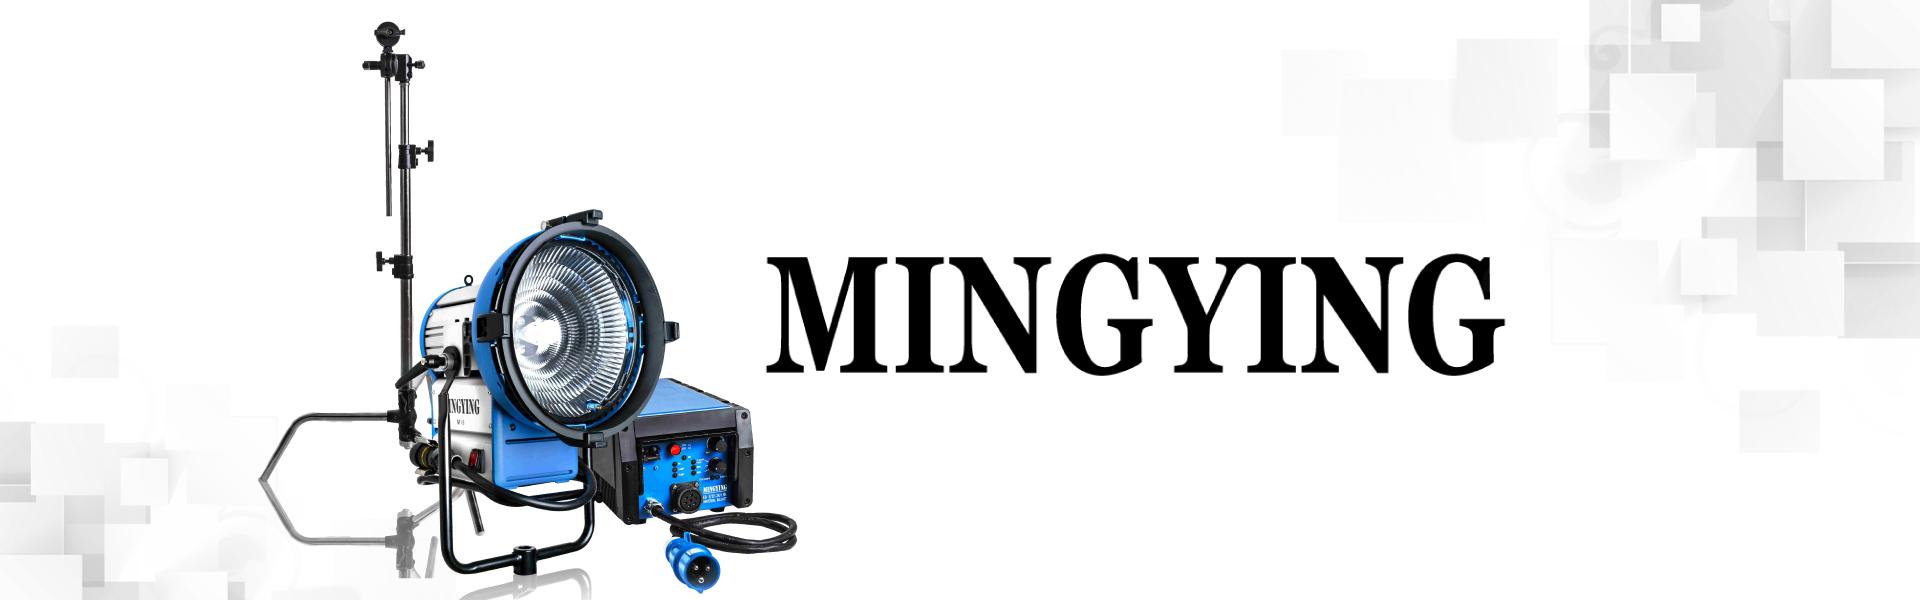 MINGYING